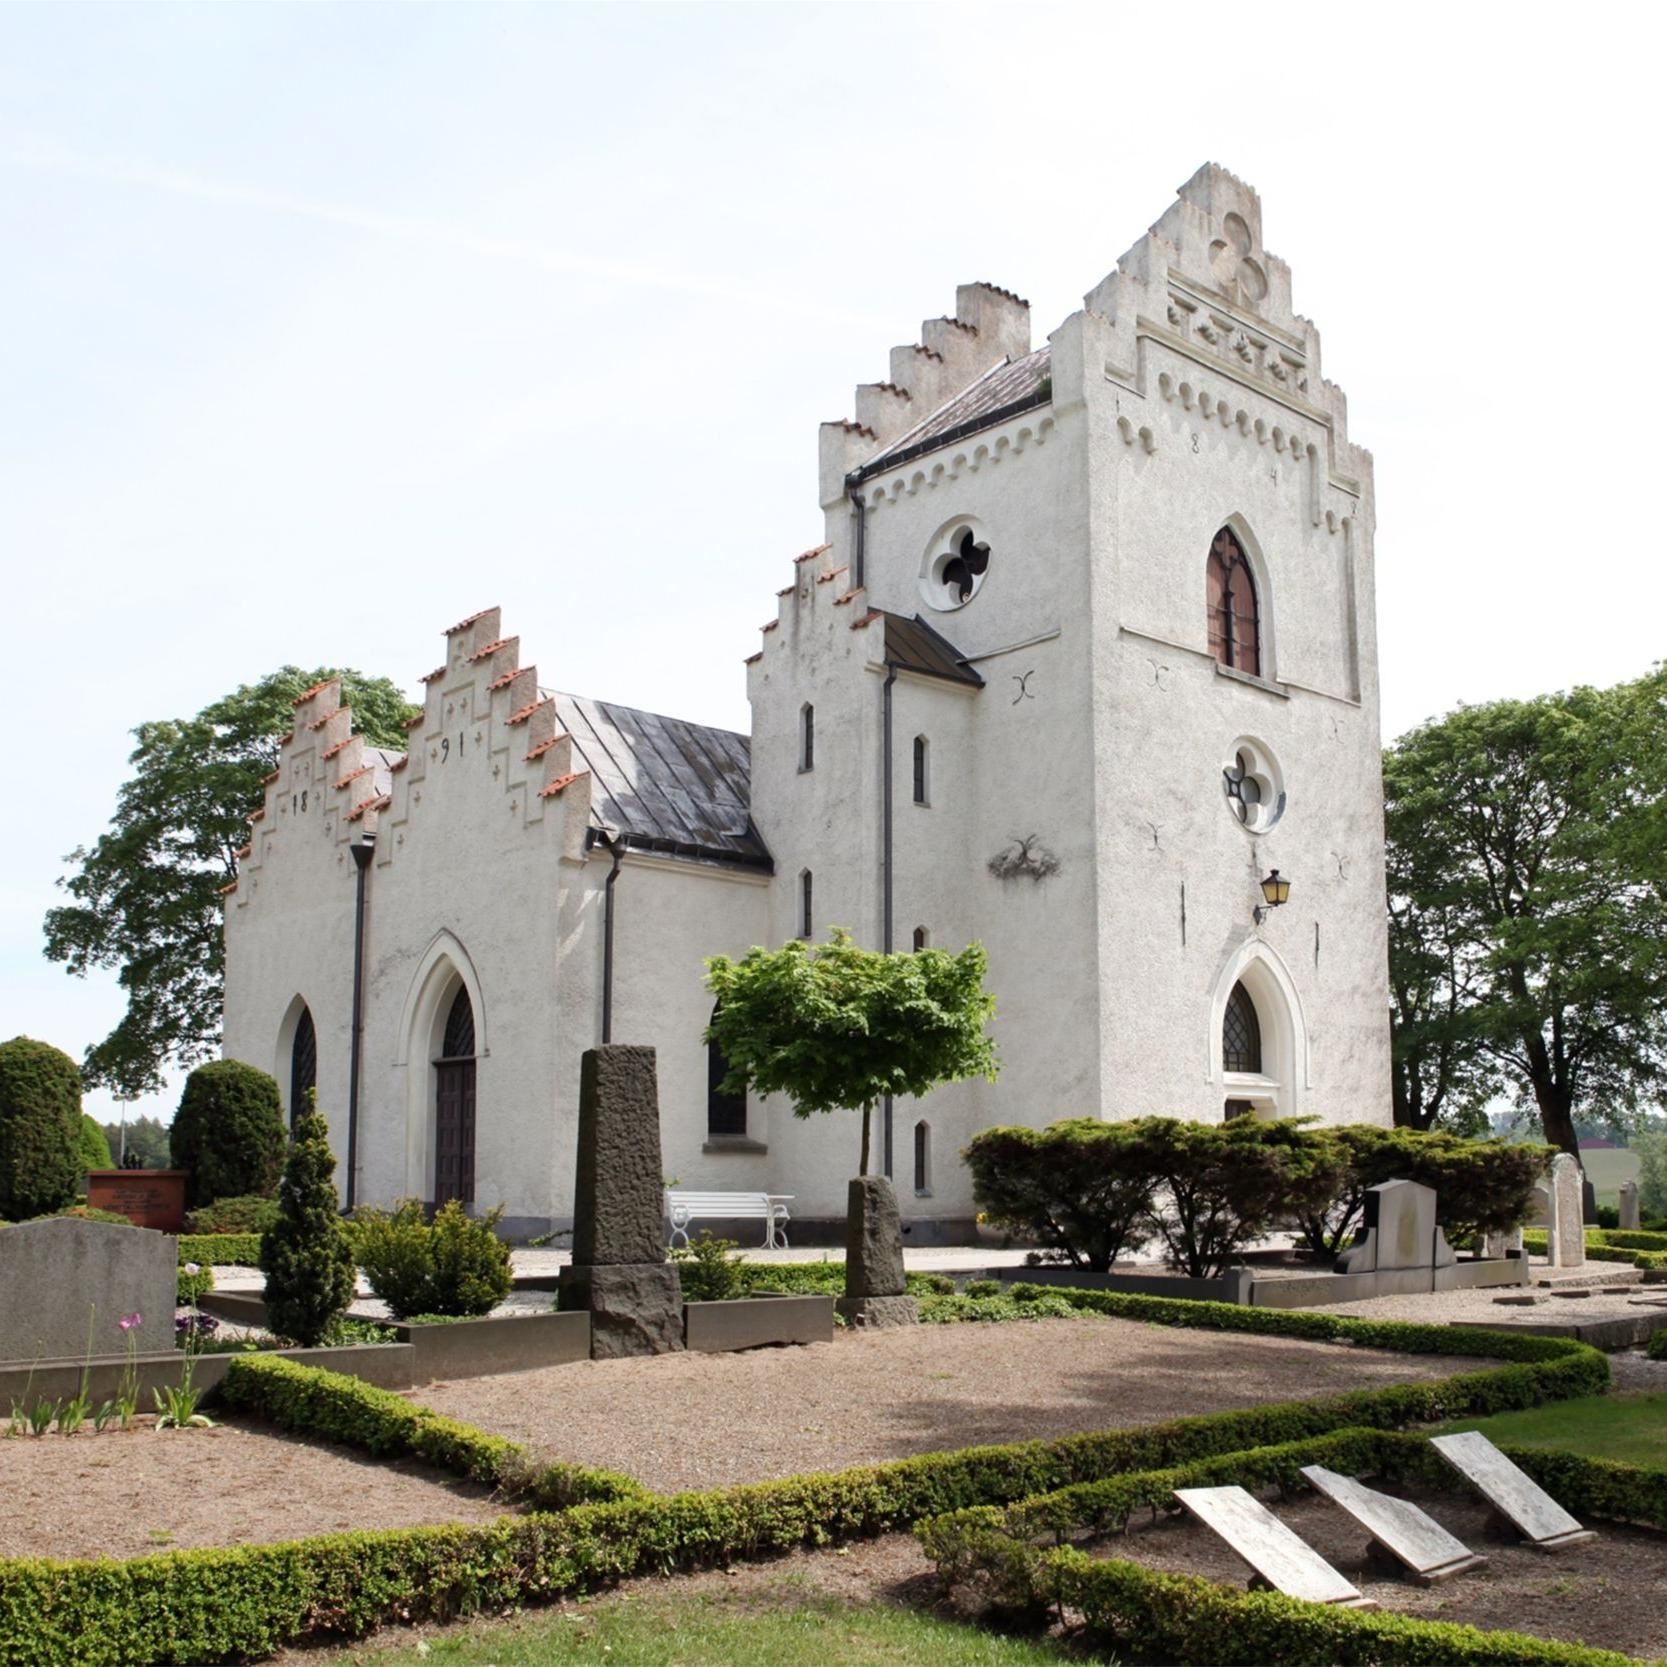 © Kävlinge kommun, Högs Kirche